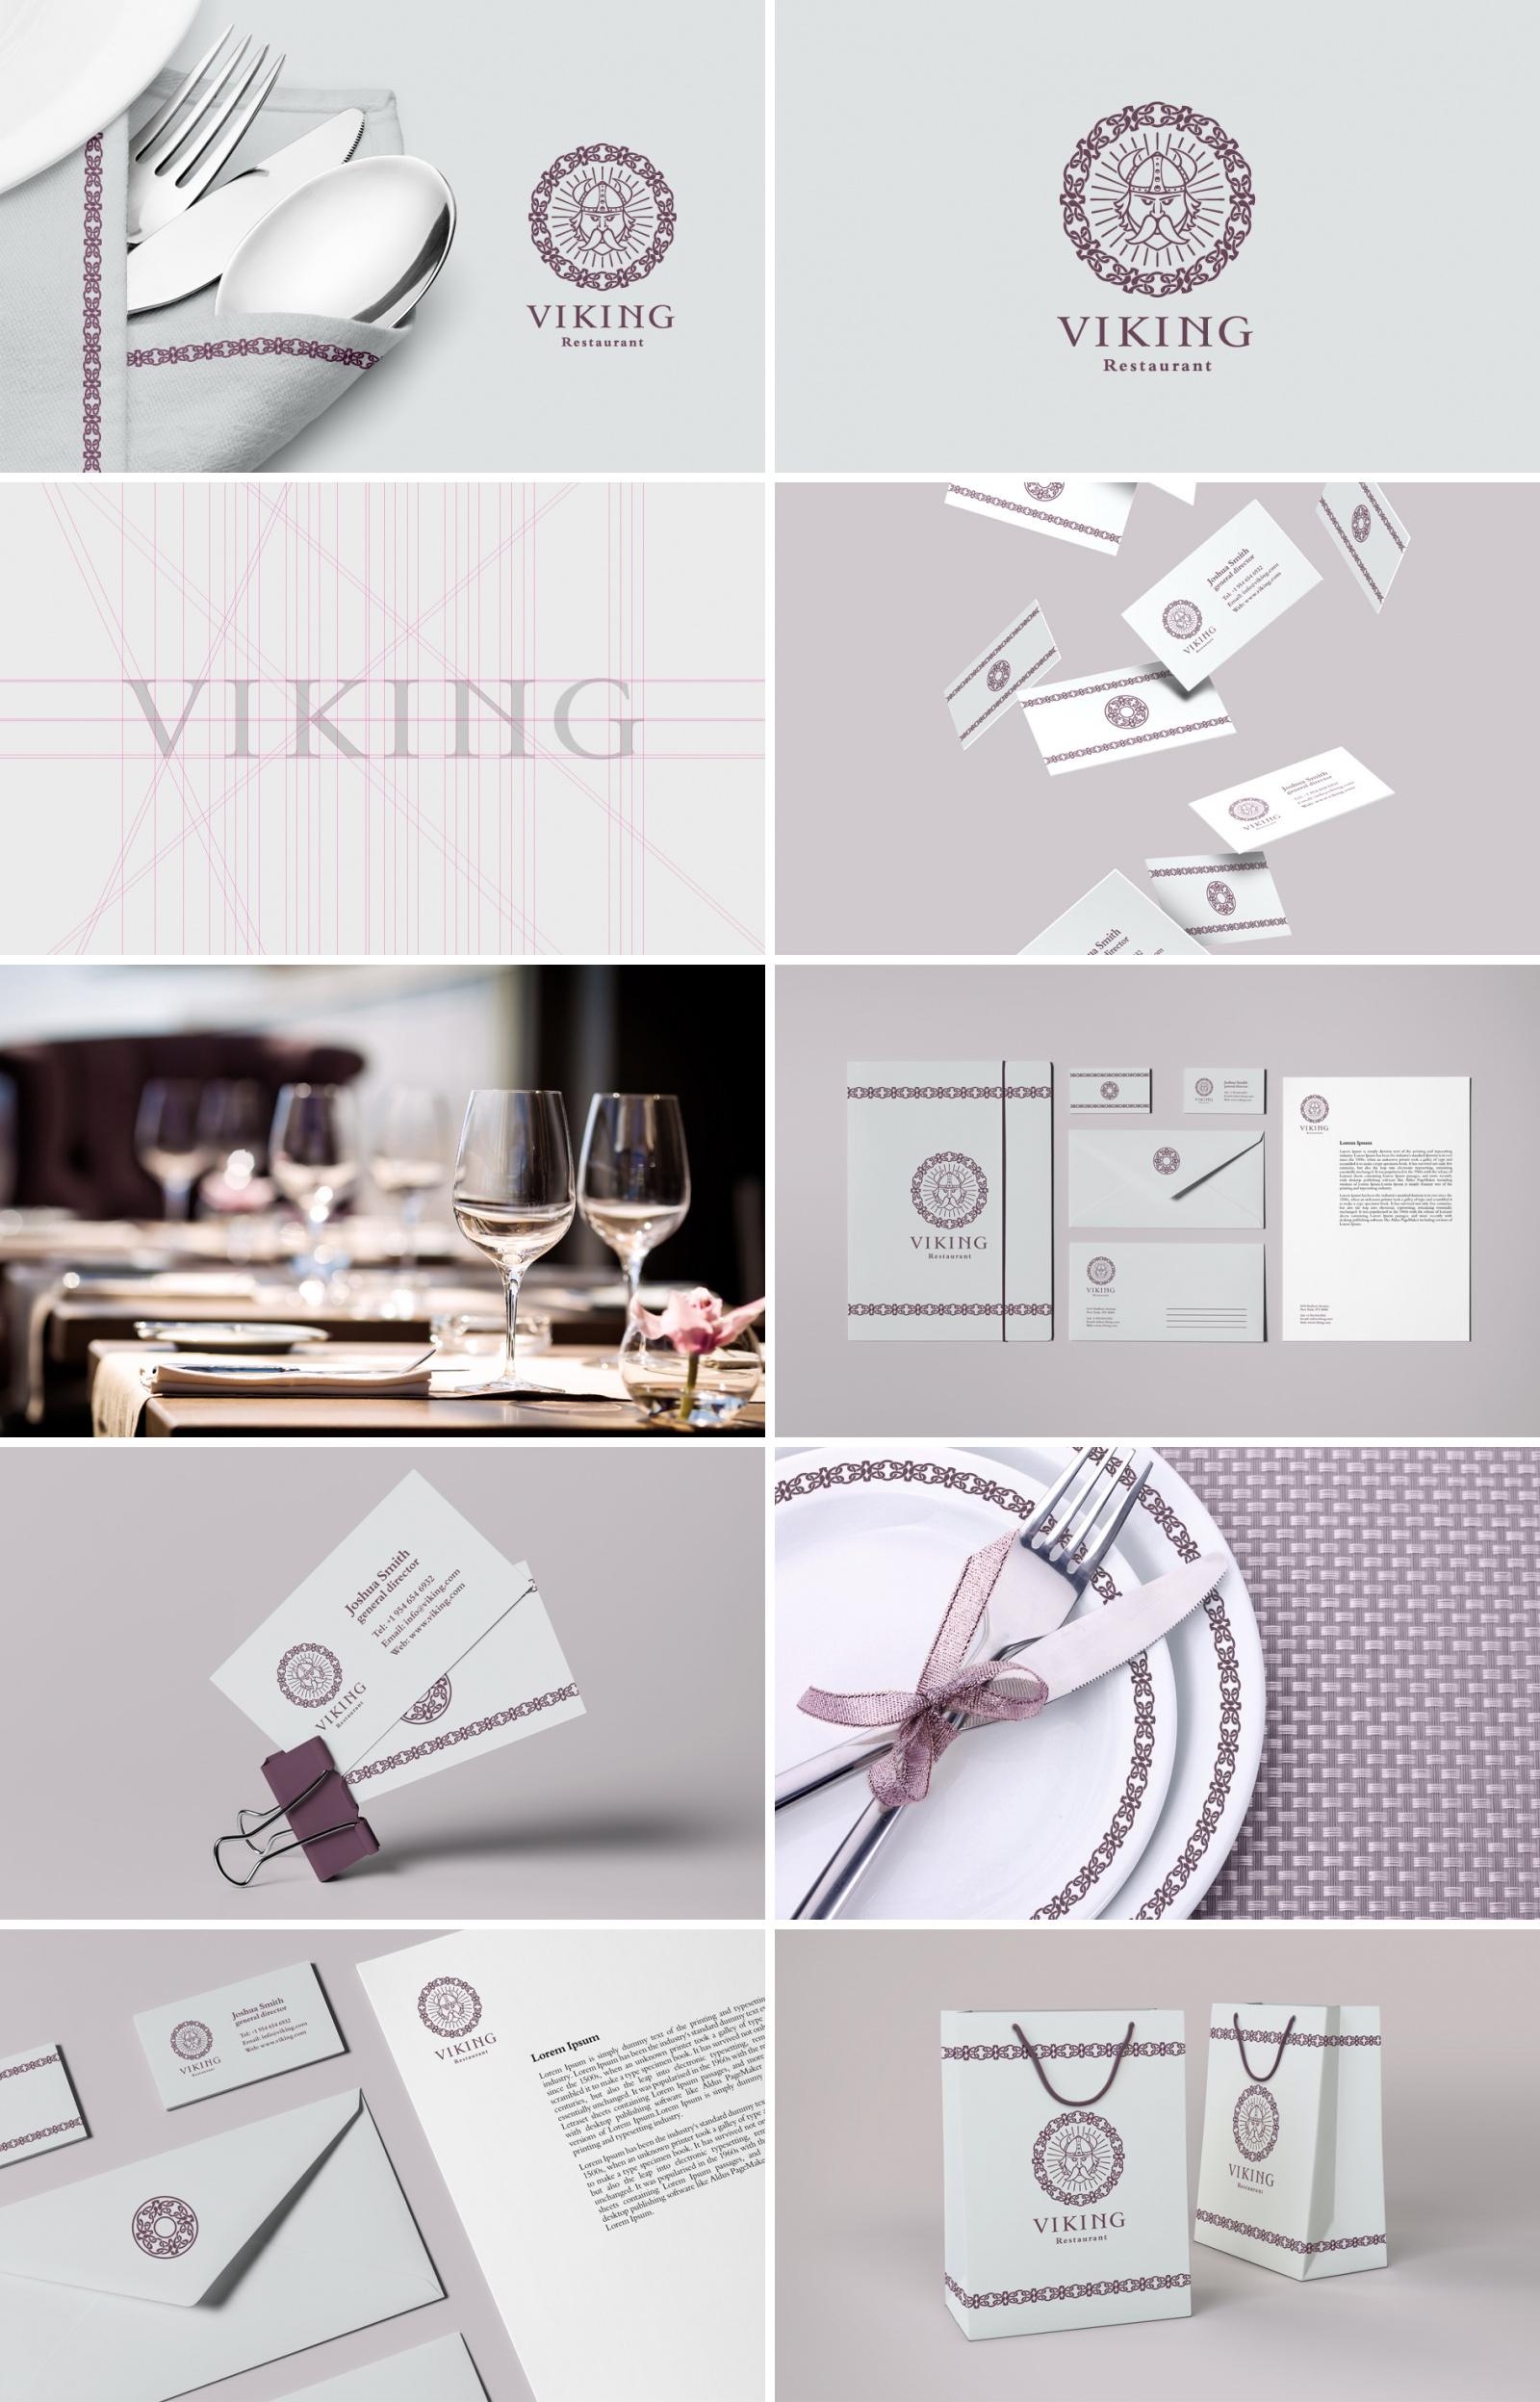 Фирменный стиль для ресторана «Viking»